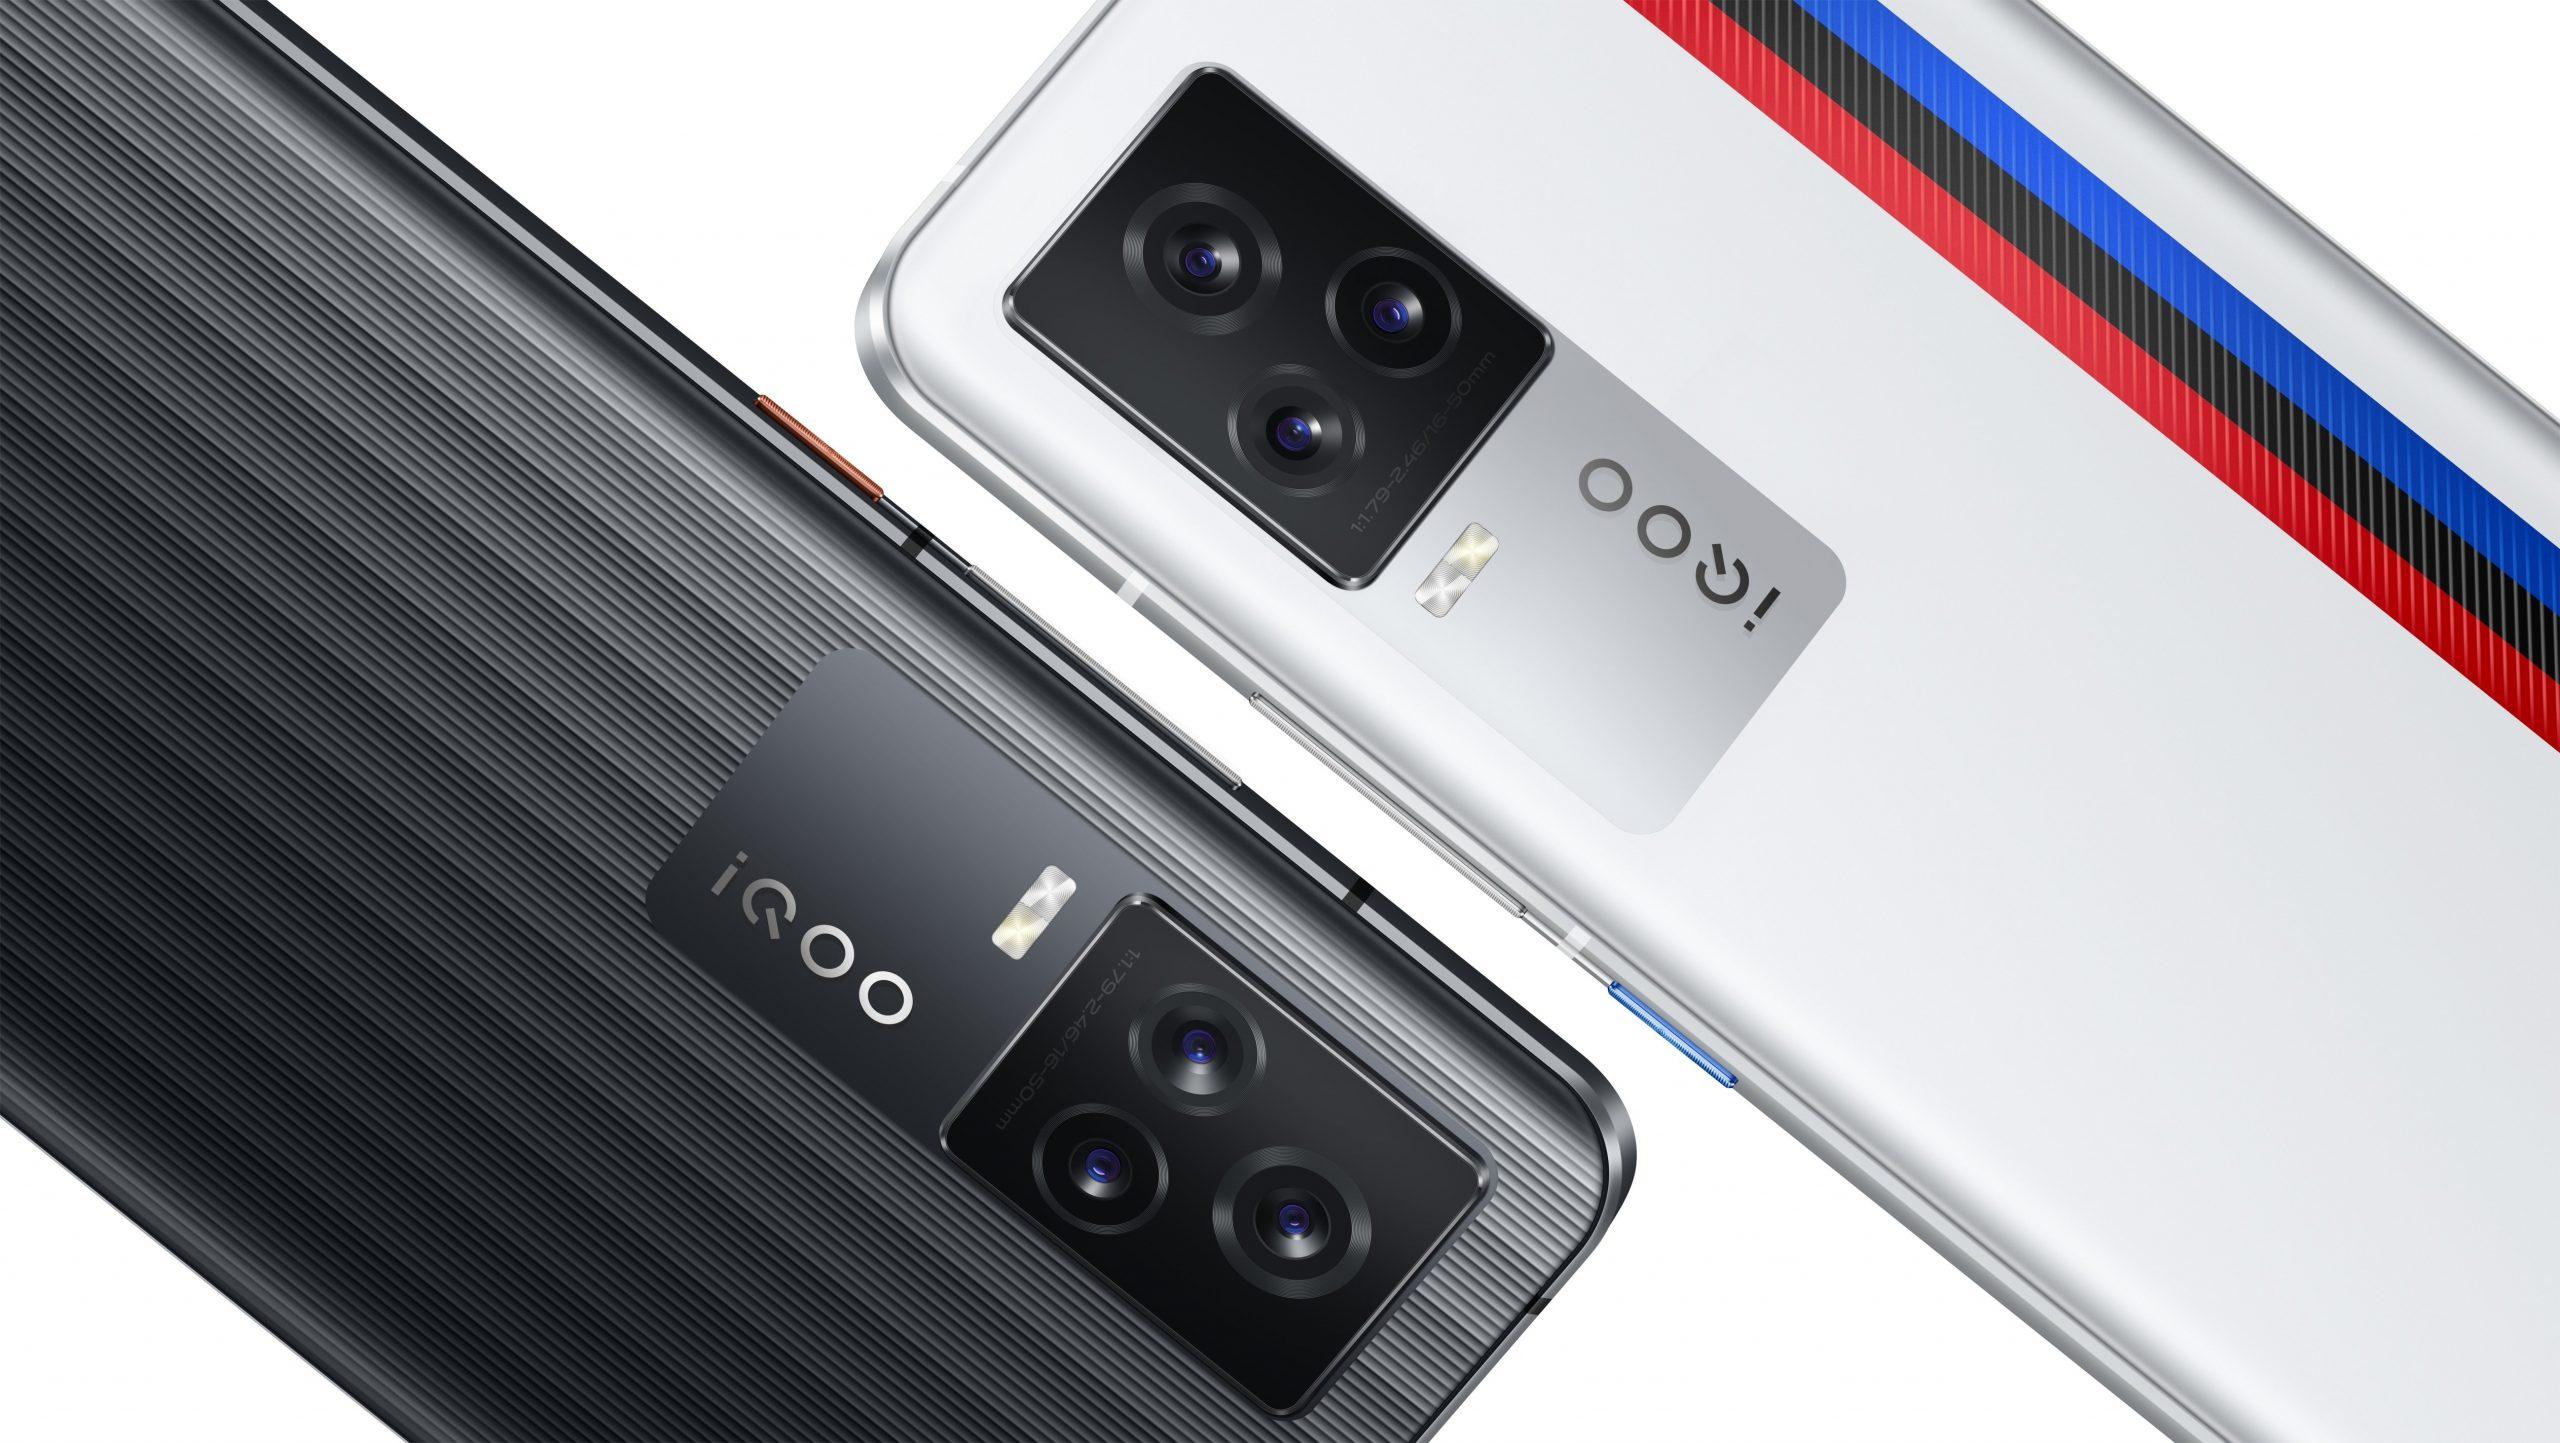 iQOO 8 is Launching Tomorrow With an Ultrasonic Fingerprint Sensor